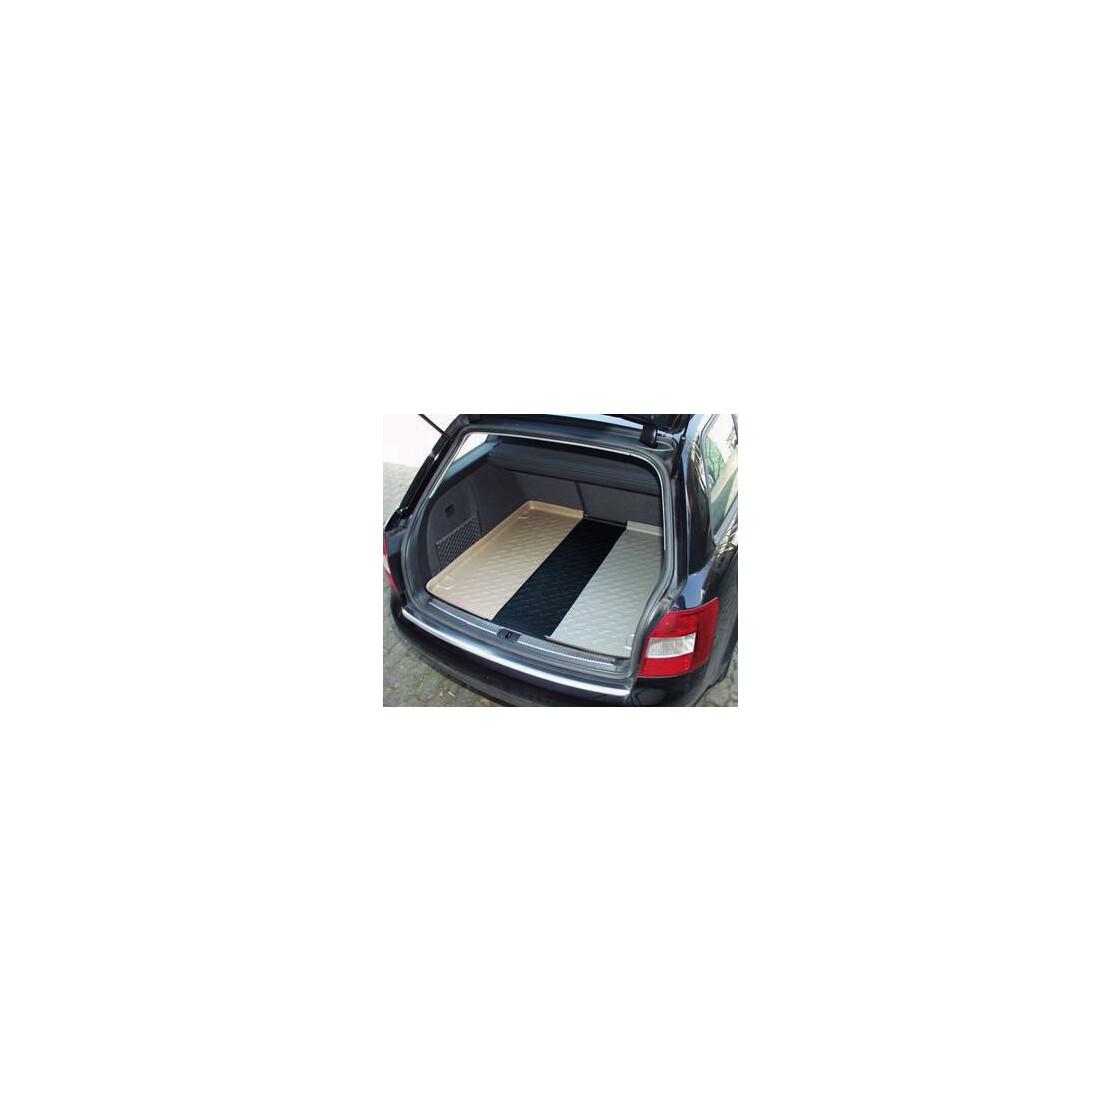 kofferraummatte eclipse cross kofferraumwanne carbox. Black Bedroom Furniture Sets. Home Design Ideas